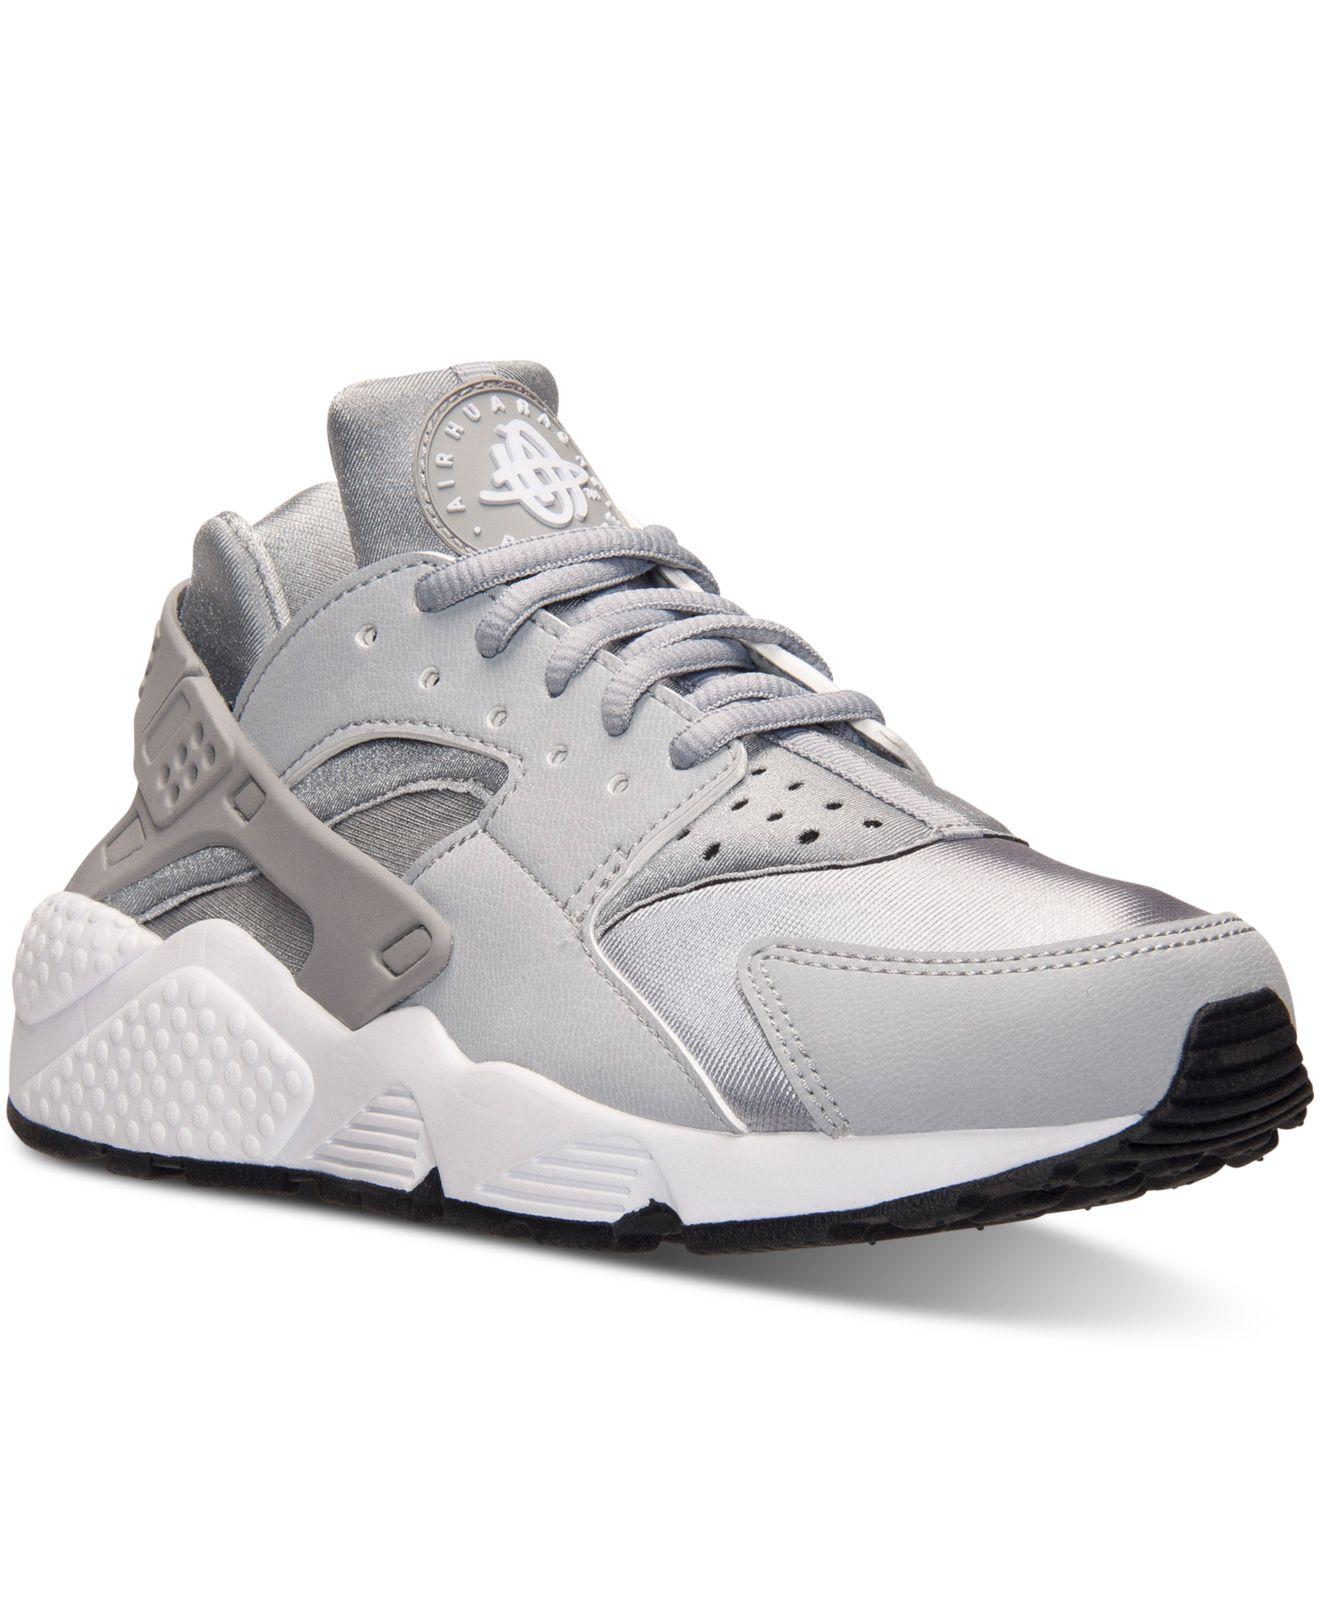 0a3b25e5efc5 Lyst - Nike Women S Air Huarache Run Running Sneakers From Finish ...